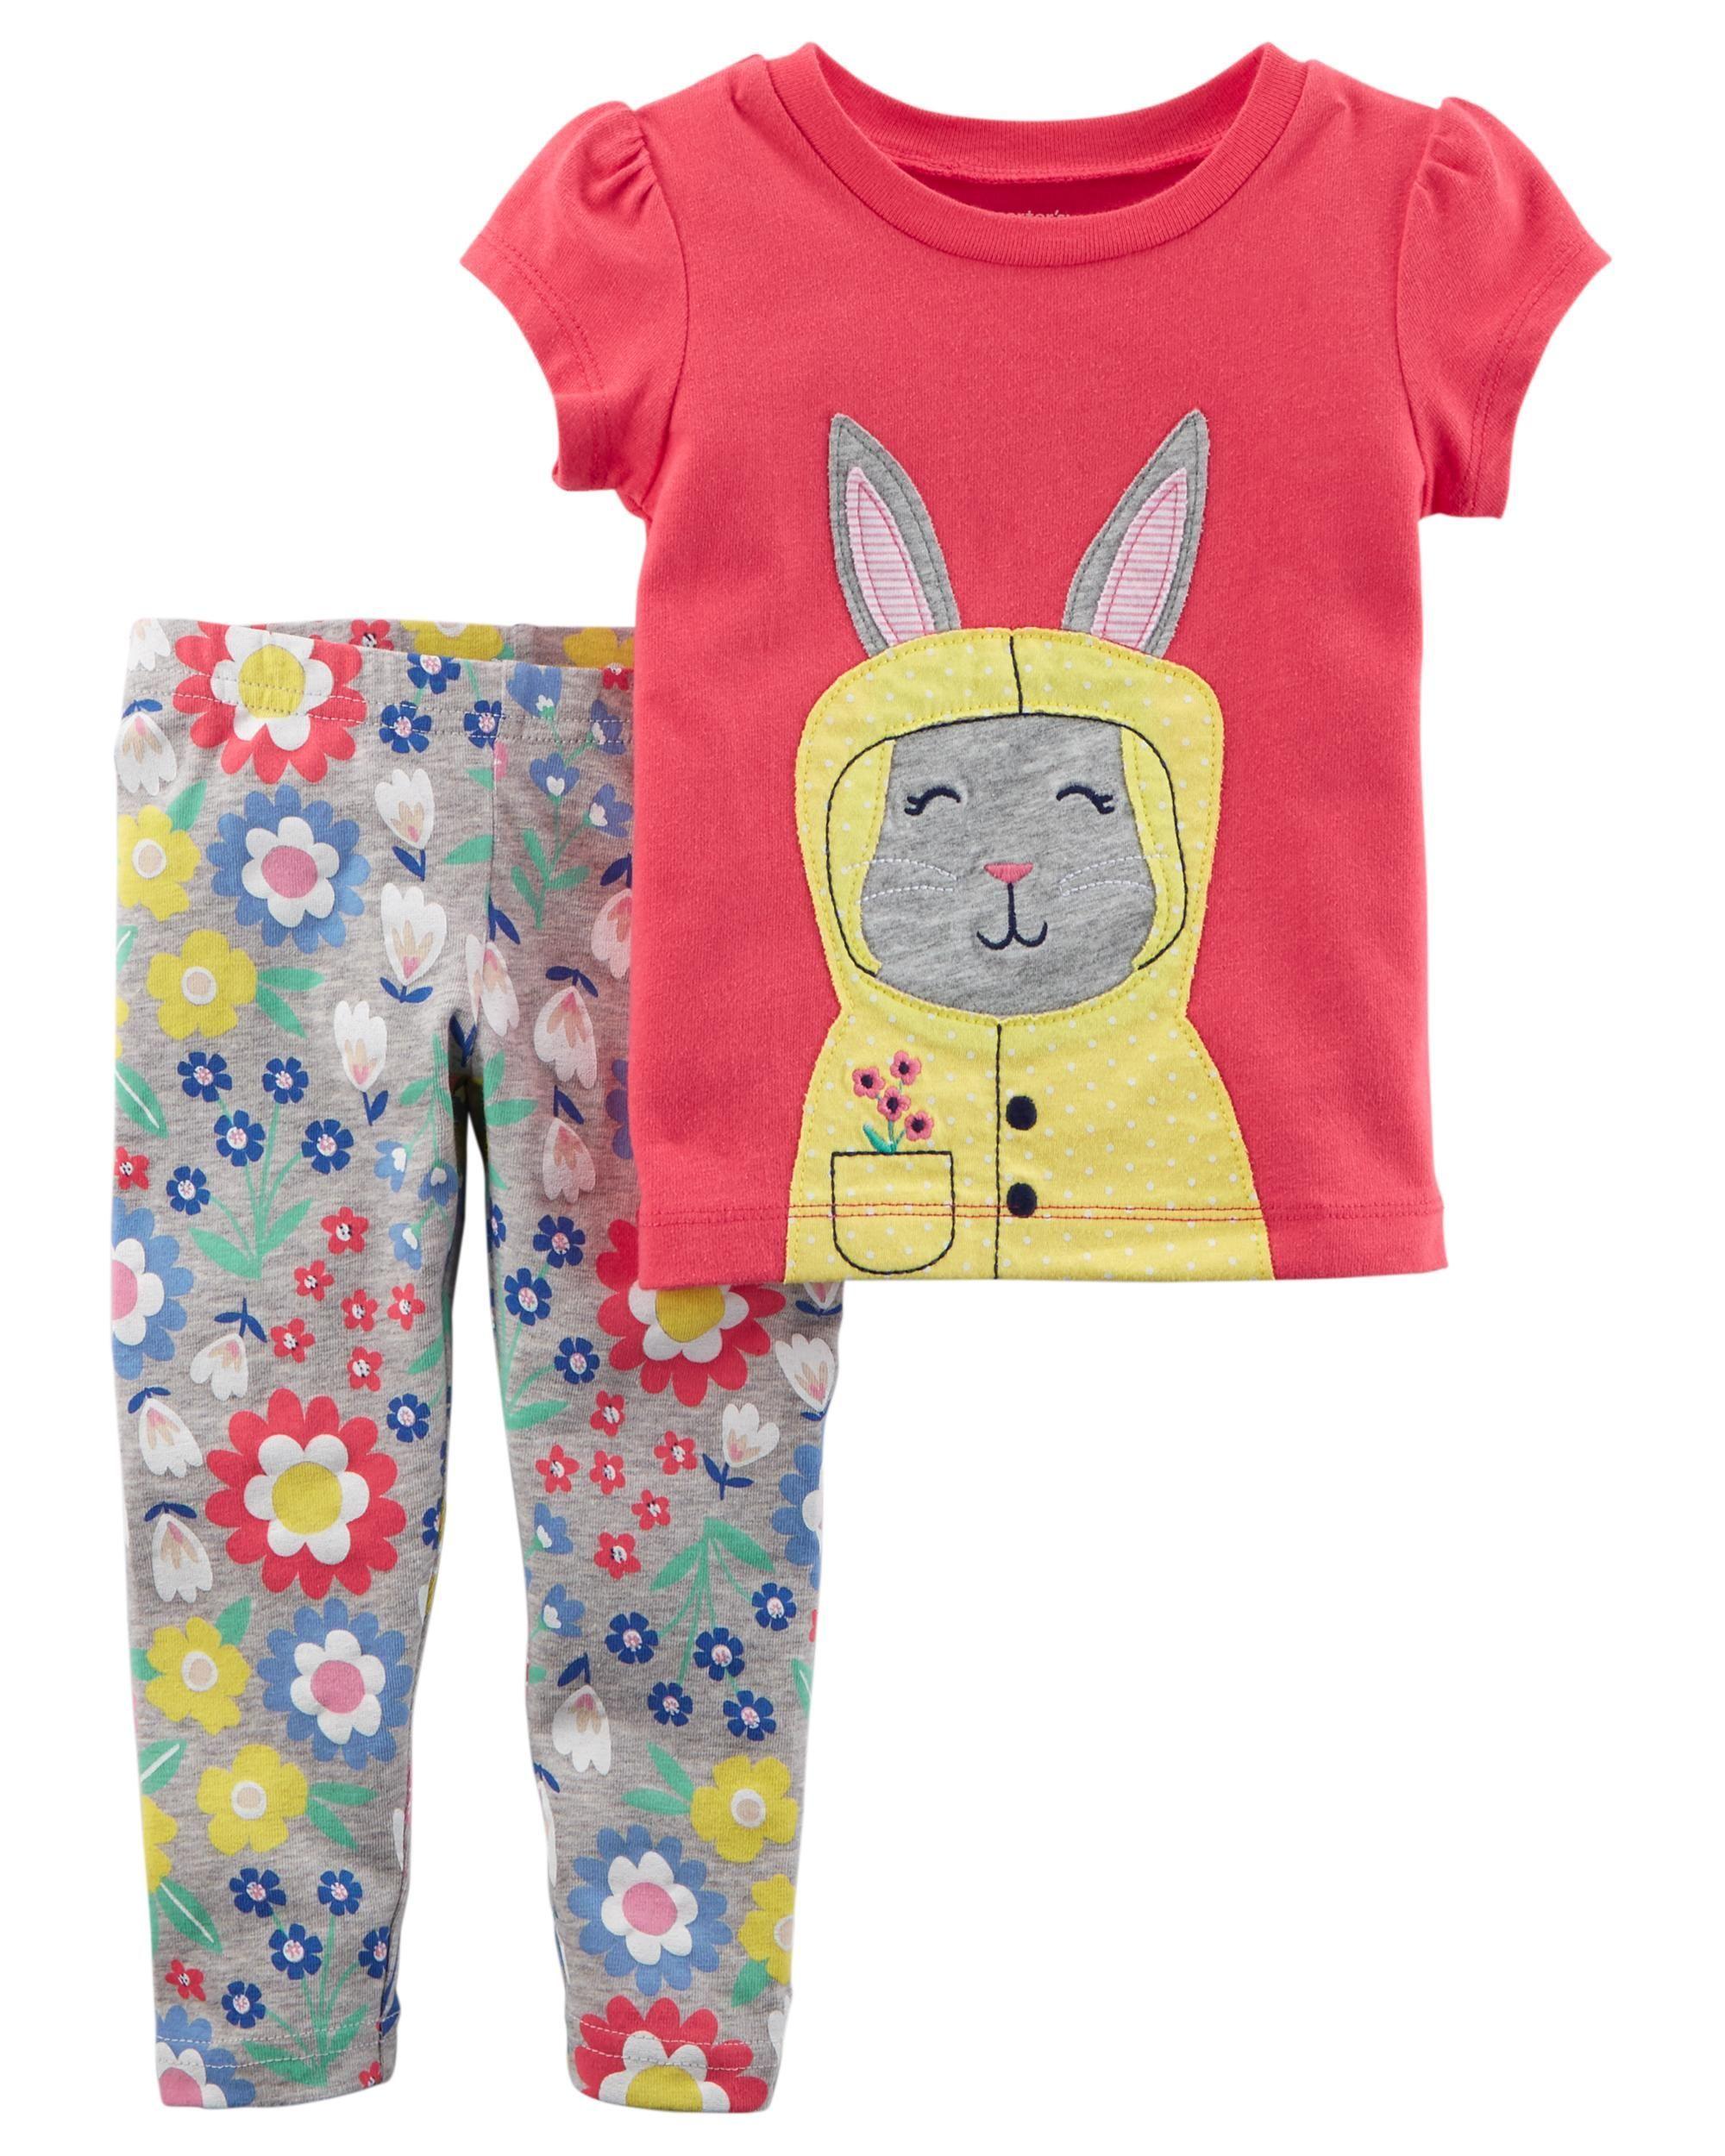 83860a230eeb5 2-Piece Jersey Top & Floral Legging Set | Girls Spring-Summer ...